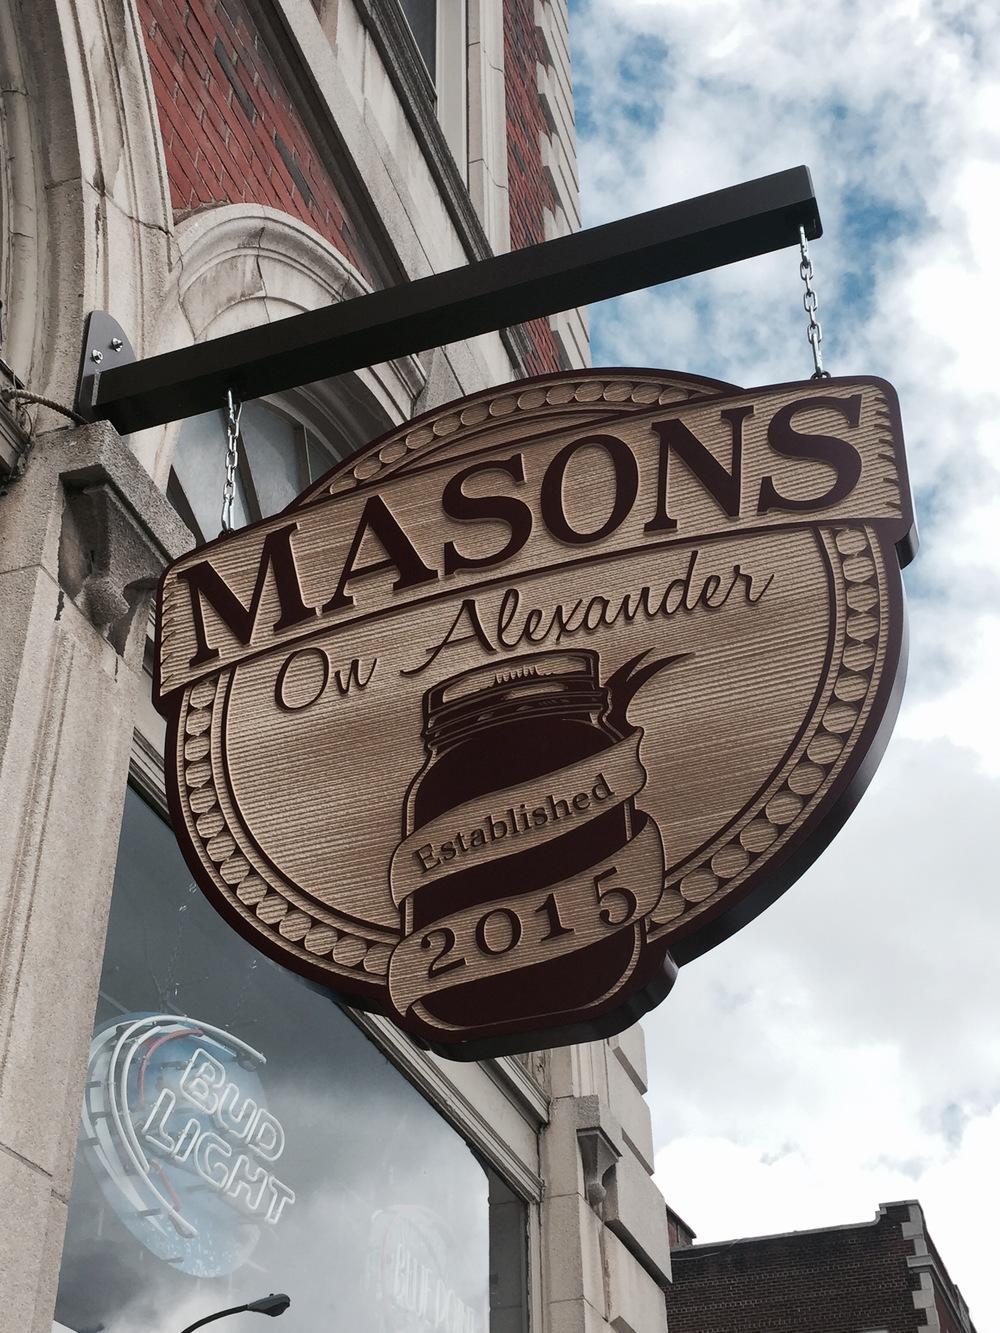 Masons On Alexander